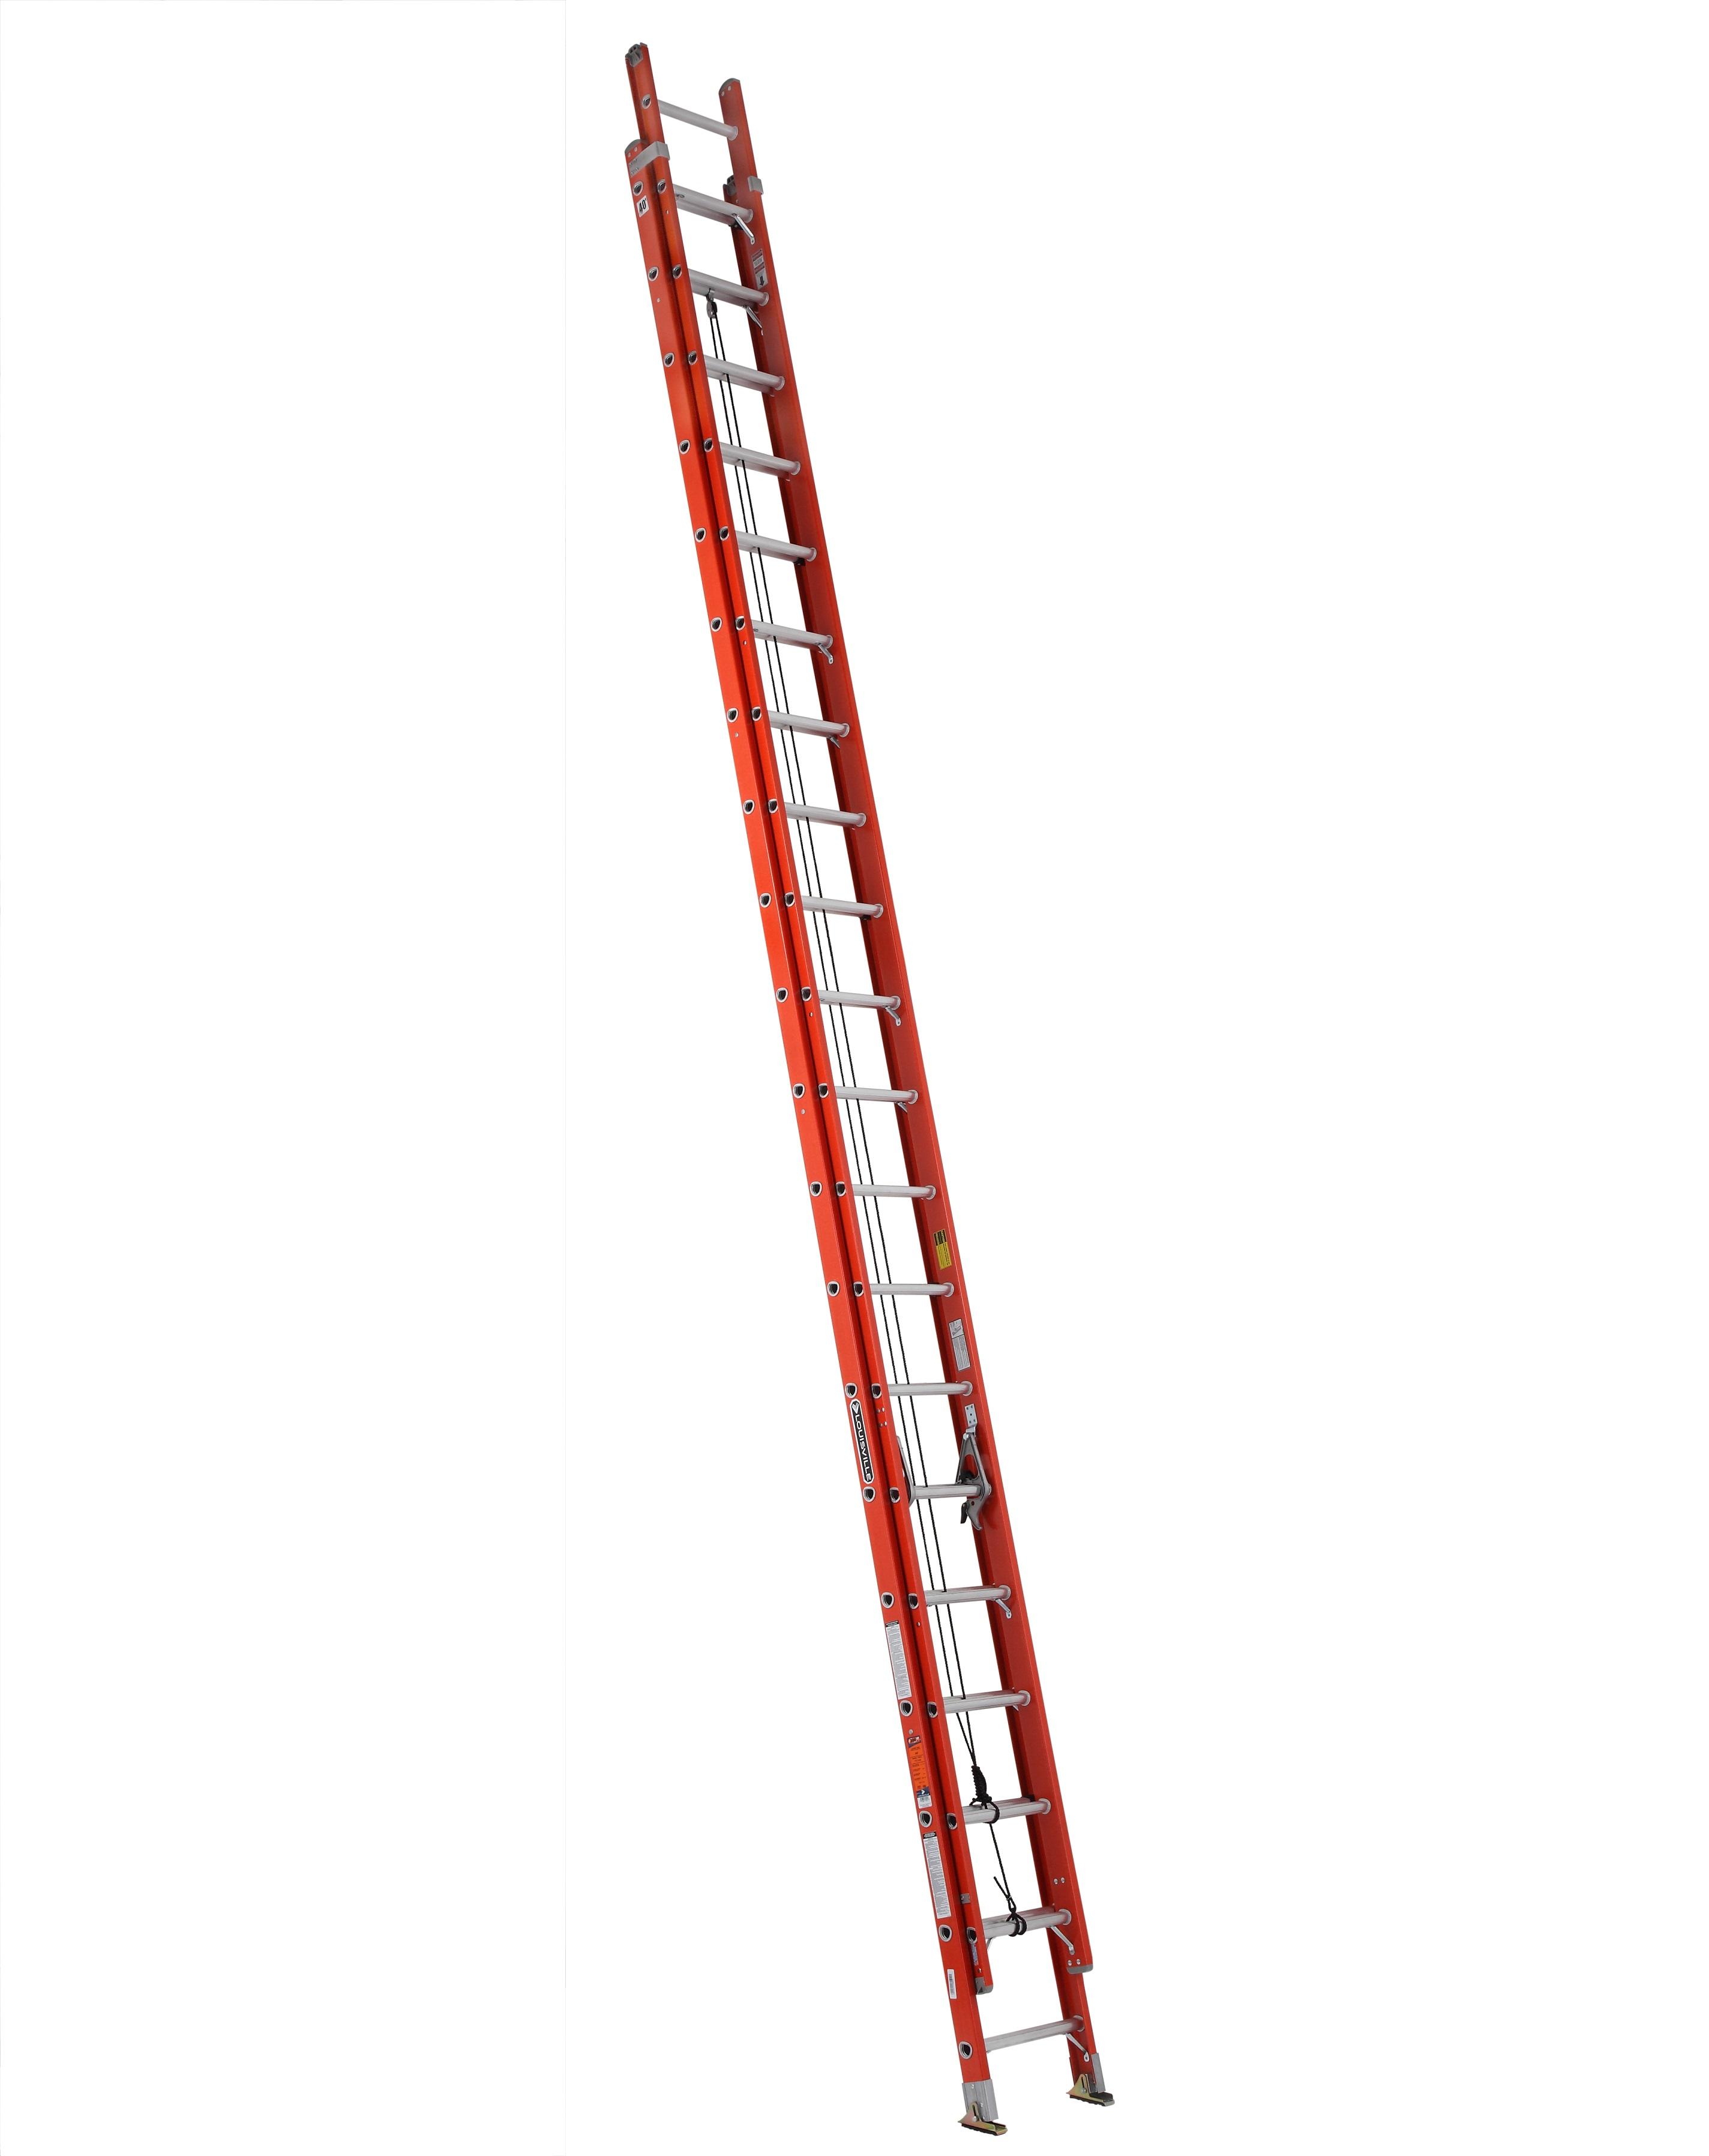 Louisville Ladder FE3240 40 Foot 300 lb Capacity Fiberglass Extension Ladder